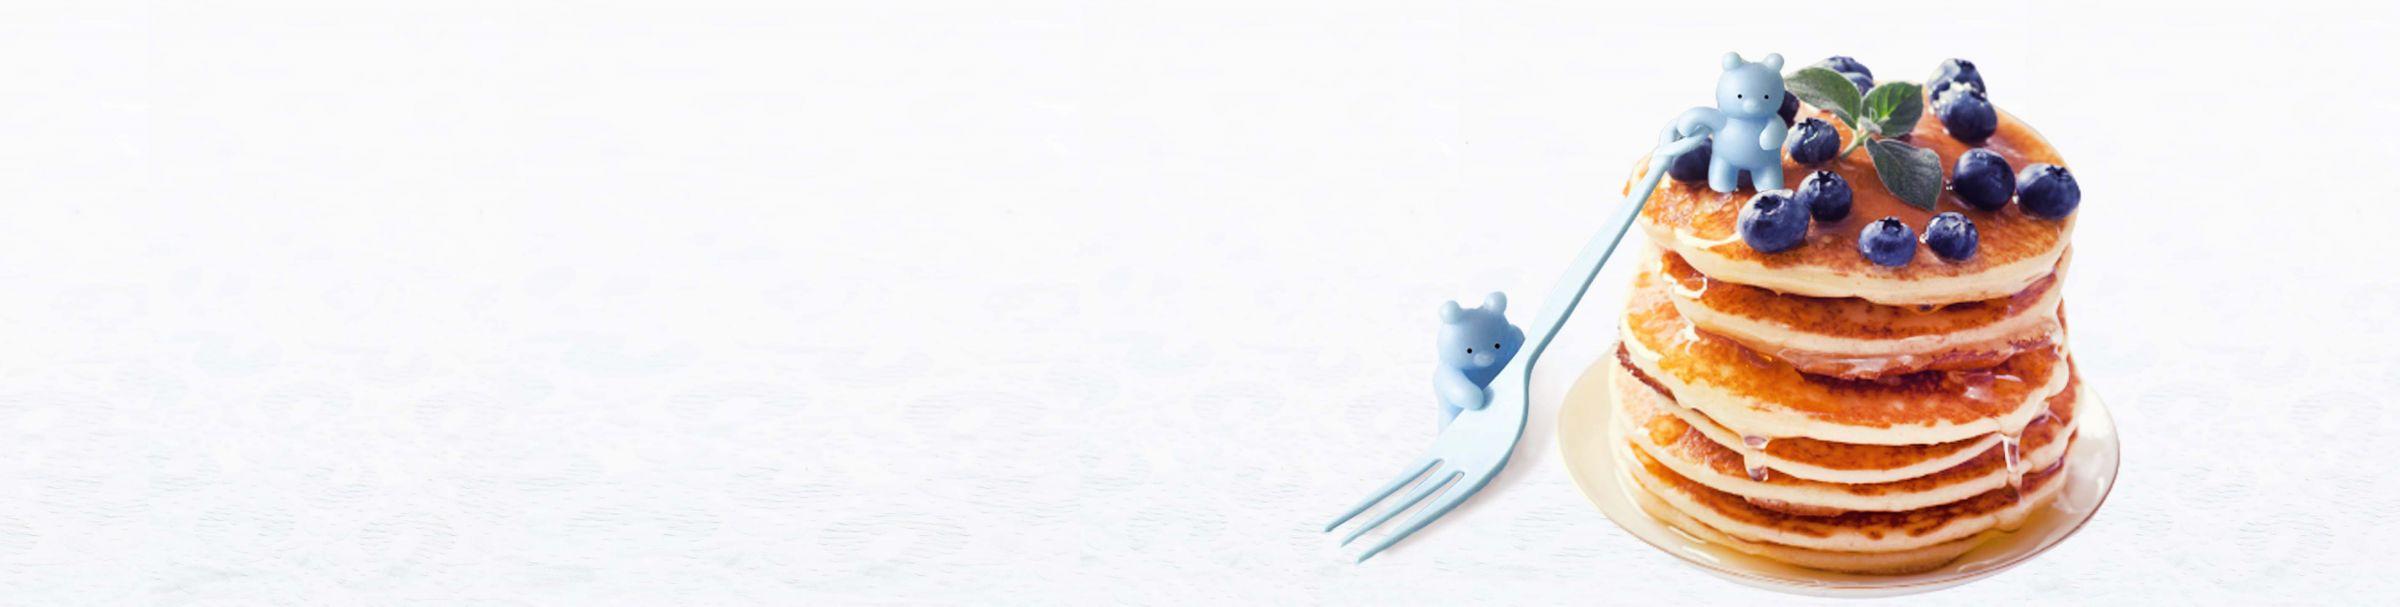 Garfo colorido de 14 cm Bolo x Salada